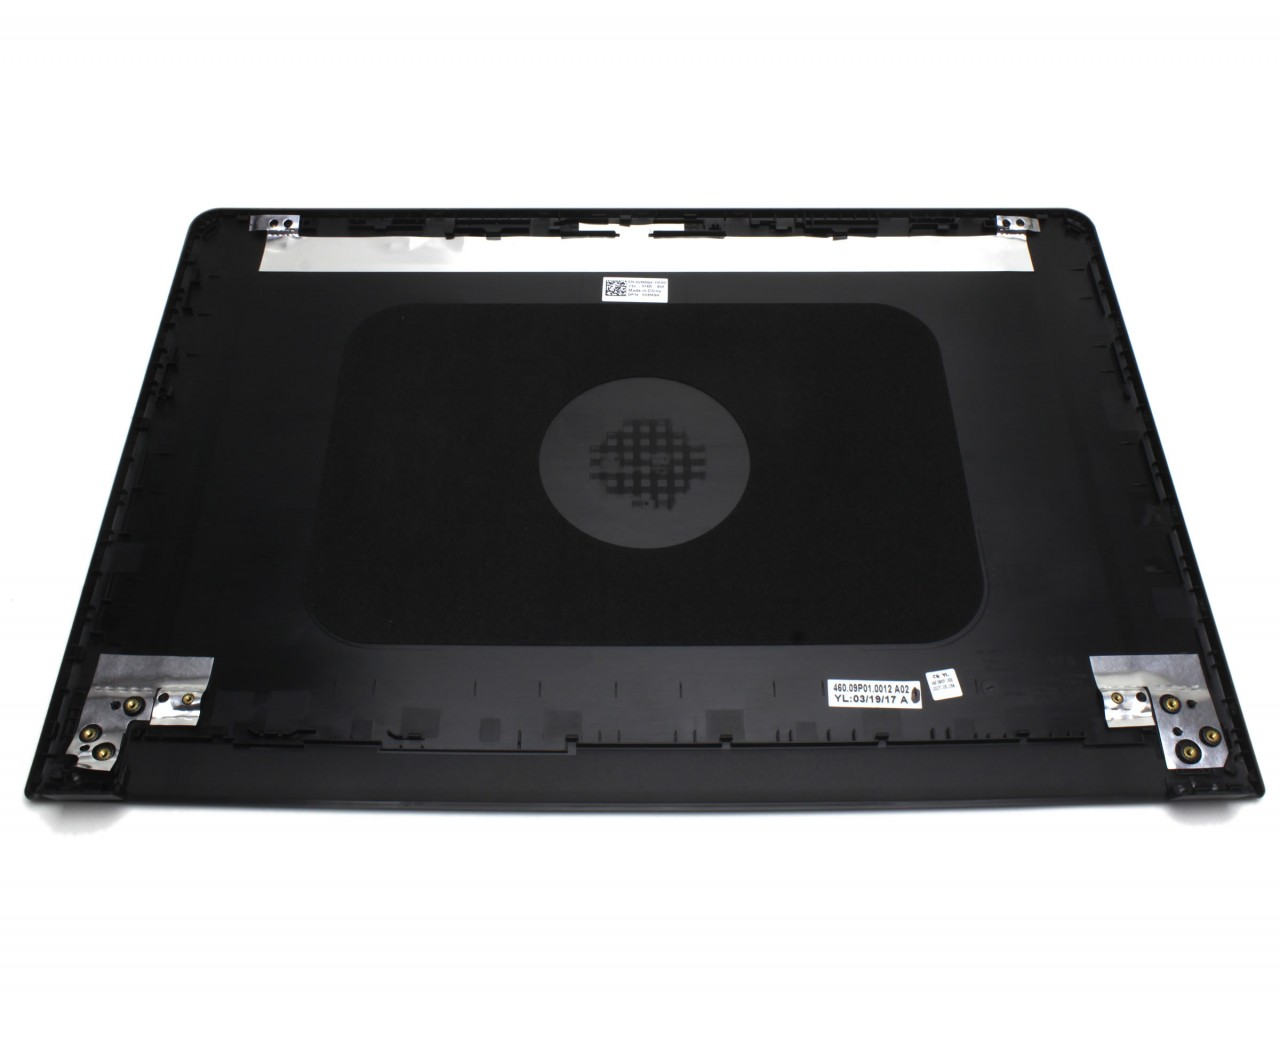 Capac Display BackCover Dell Vostro 15 3562 Carcasa Display Neagra imagine powerlaptop.ro 2021